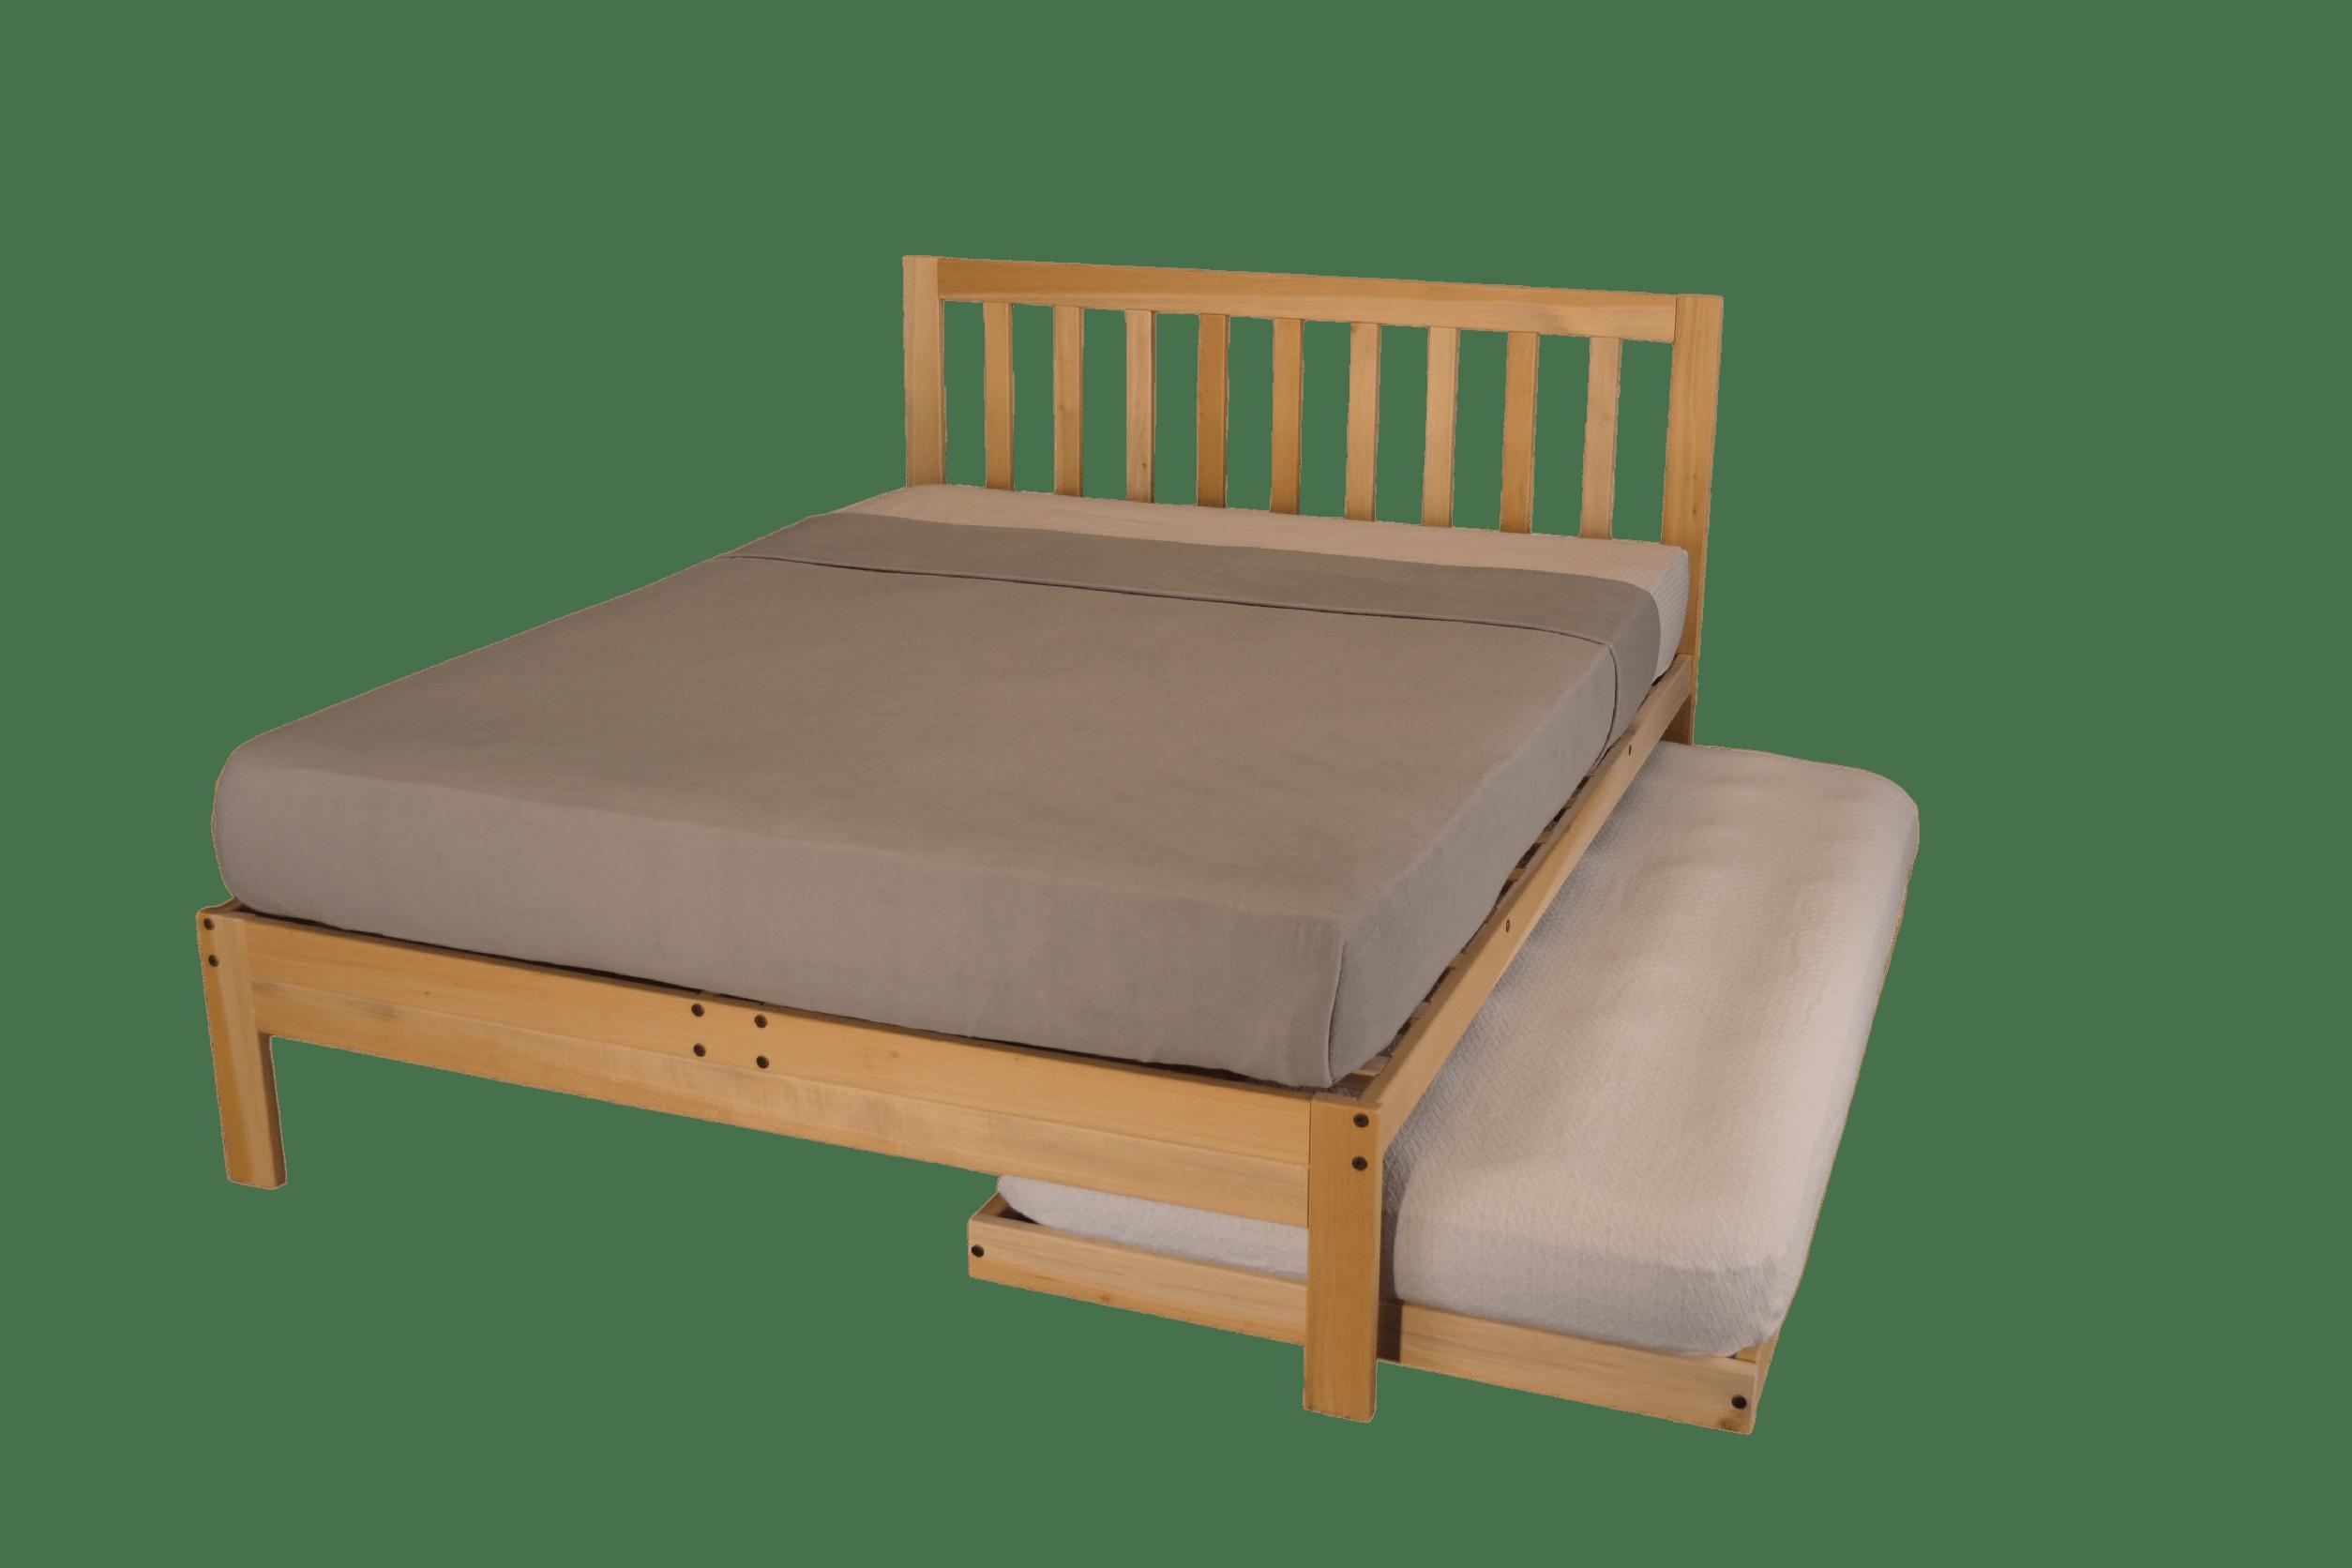 sears full size sleeper sofa modular au futon trundle bed